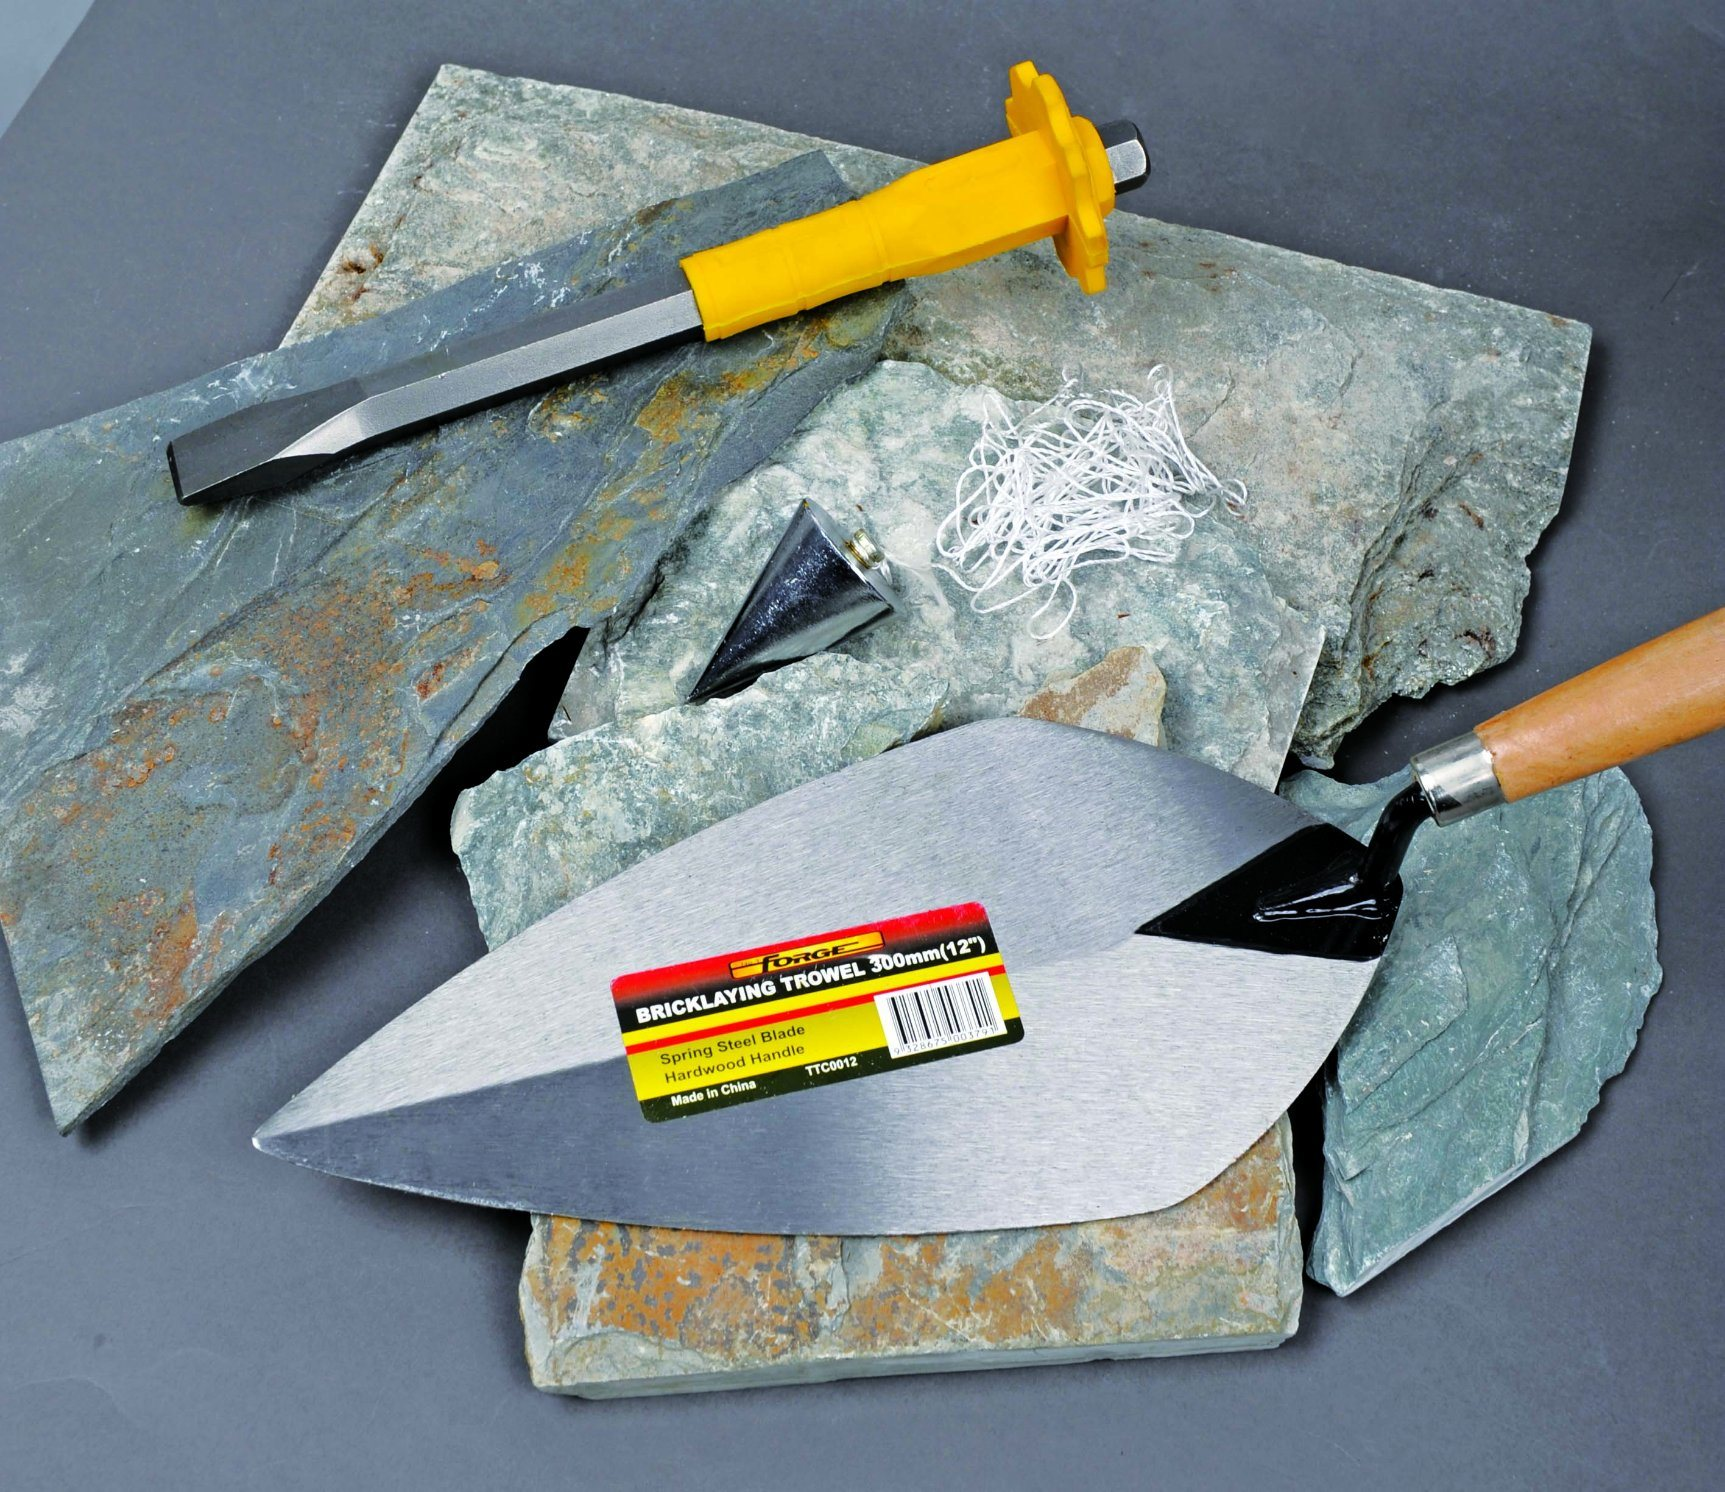 High Quality Measuring Tools Anti-Corrosion Machine Steel Plumb Bob